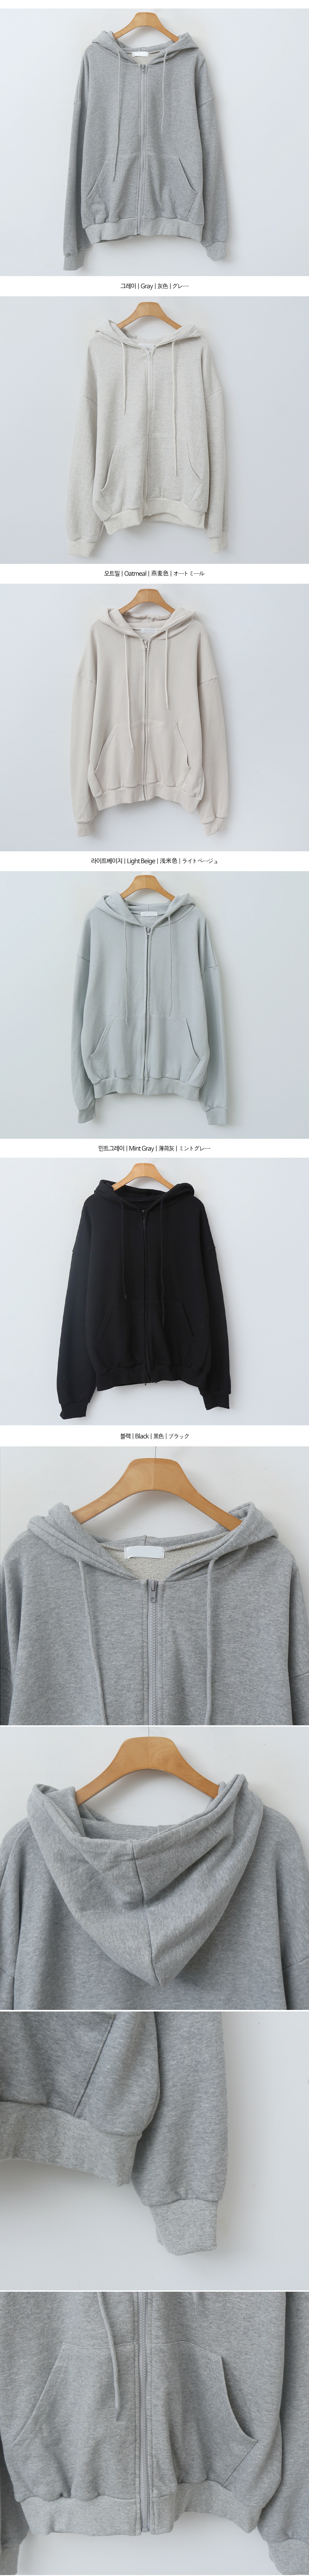 Daily hood zip-up